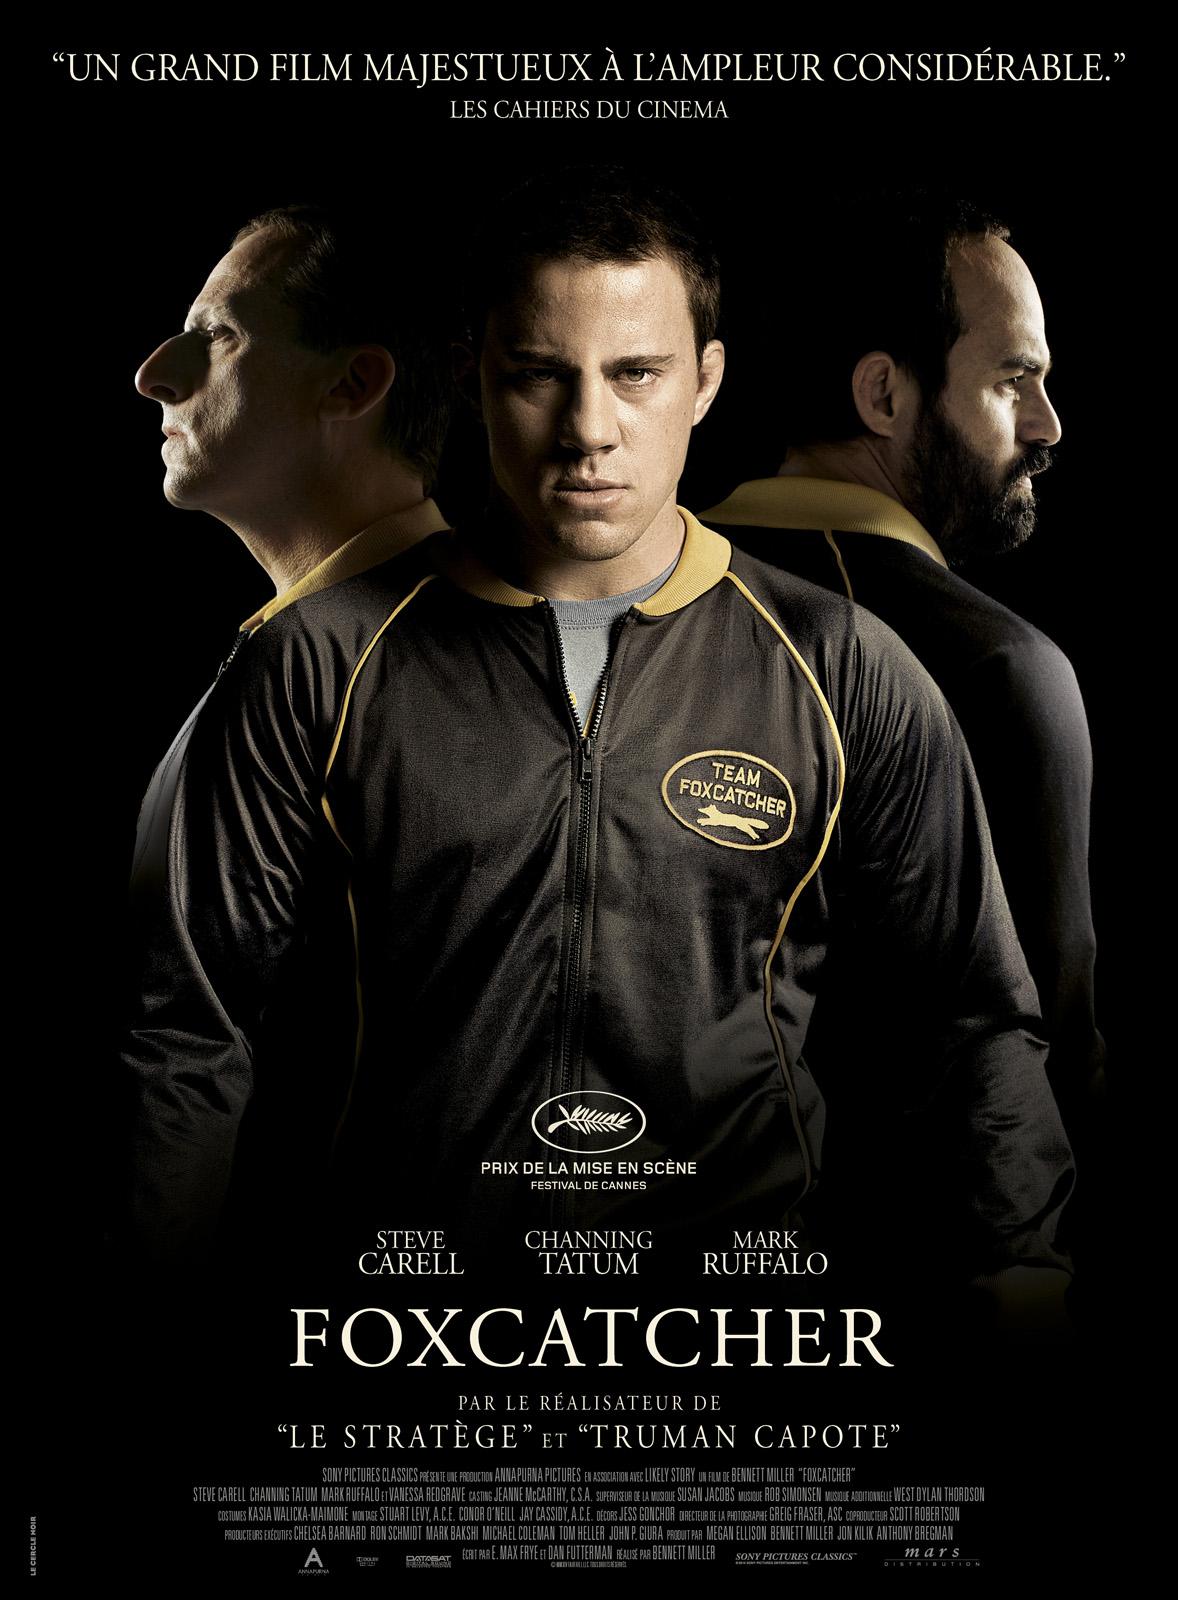 foxcatcher film 2014 allocin. Black Bedroom Furniture Sets. Home Design Ideas